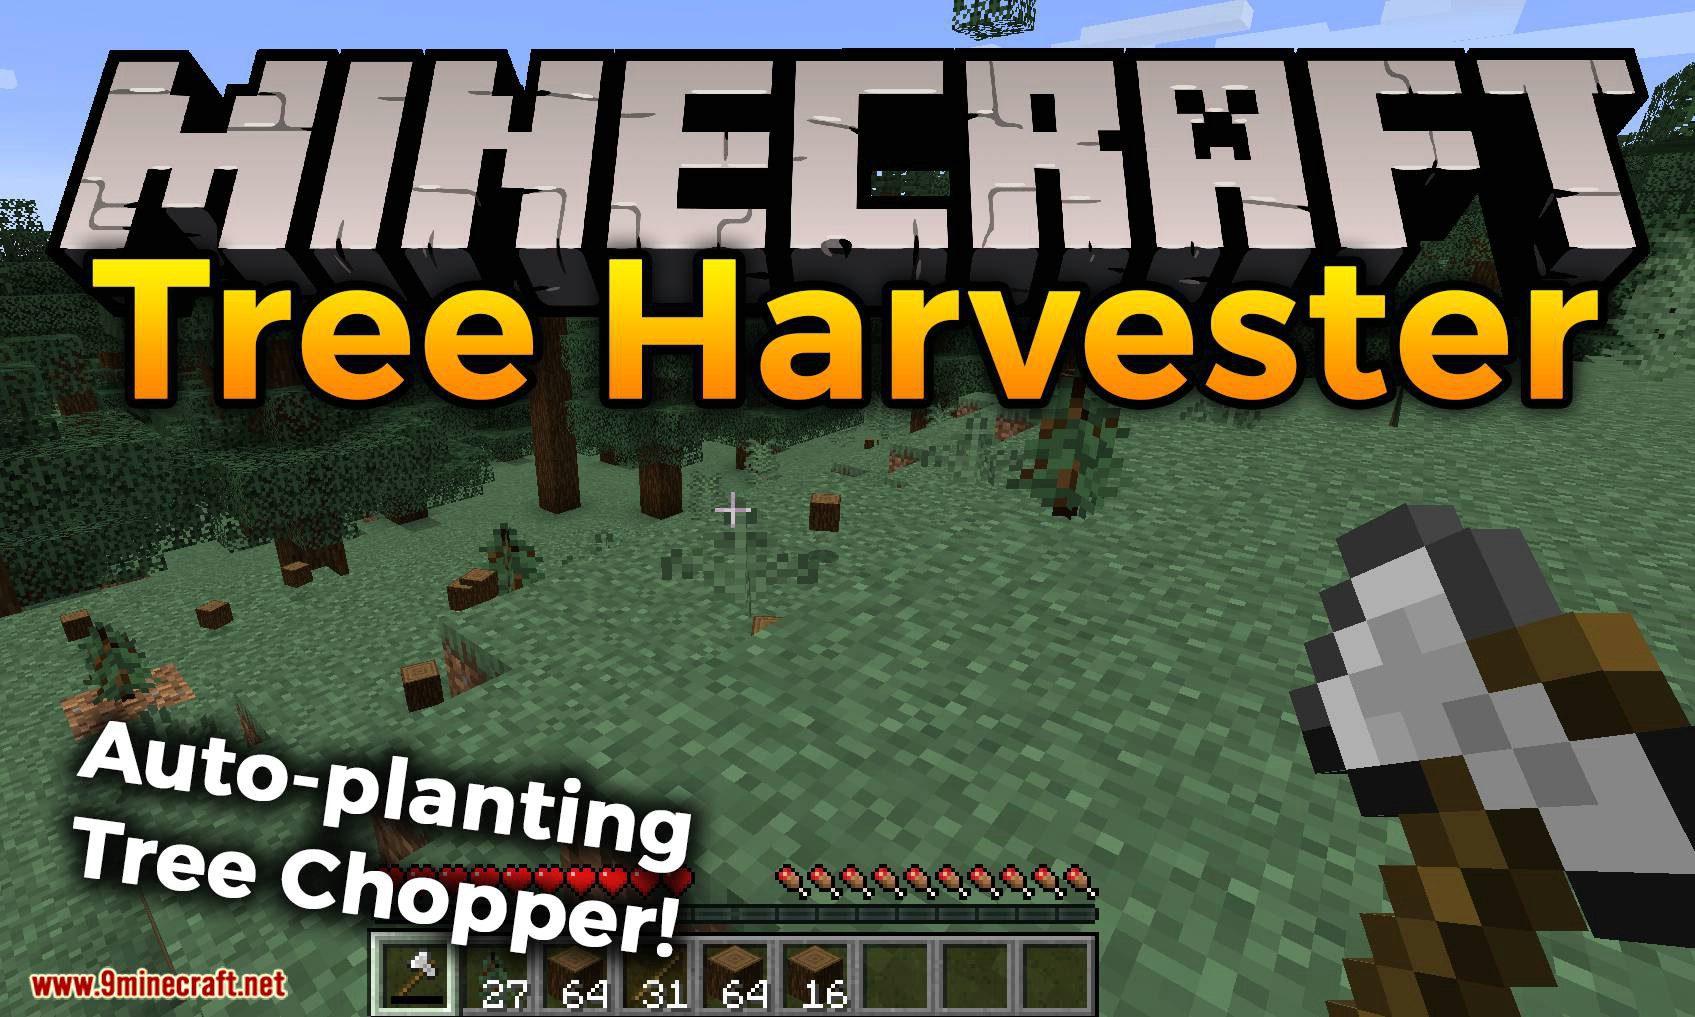 Tree Harvester mod for minecraft logo